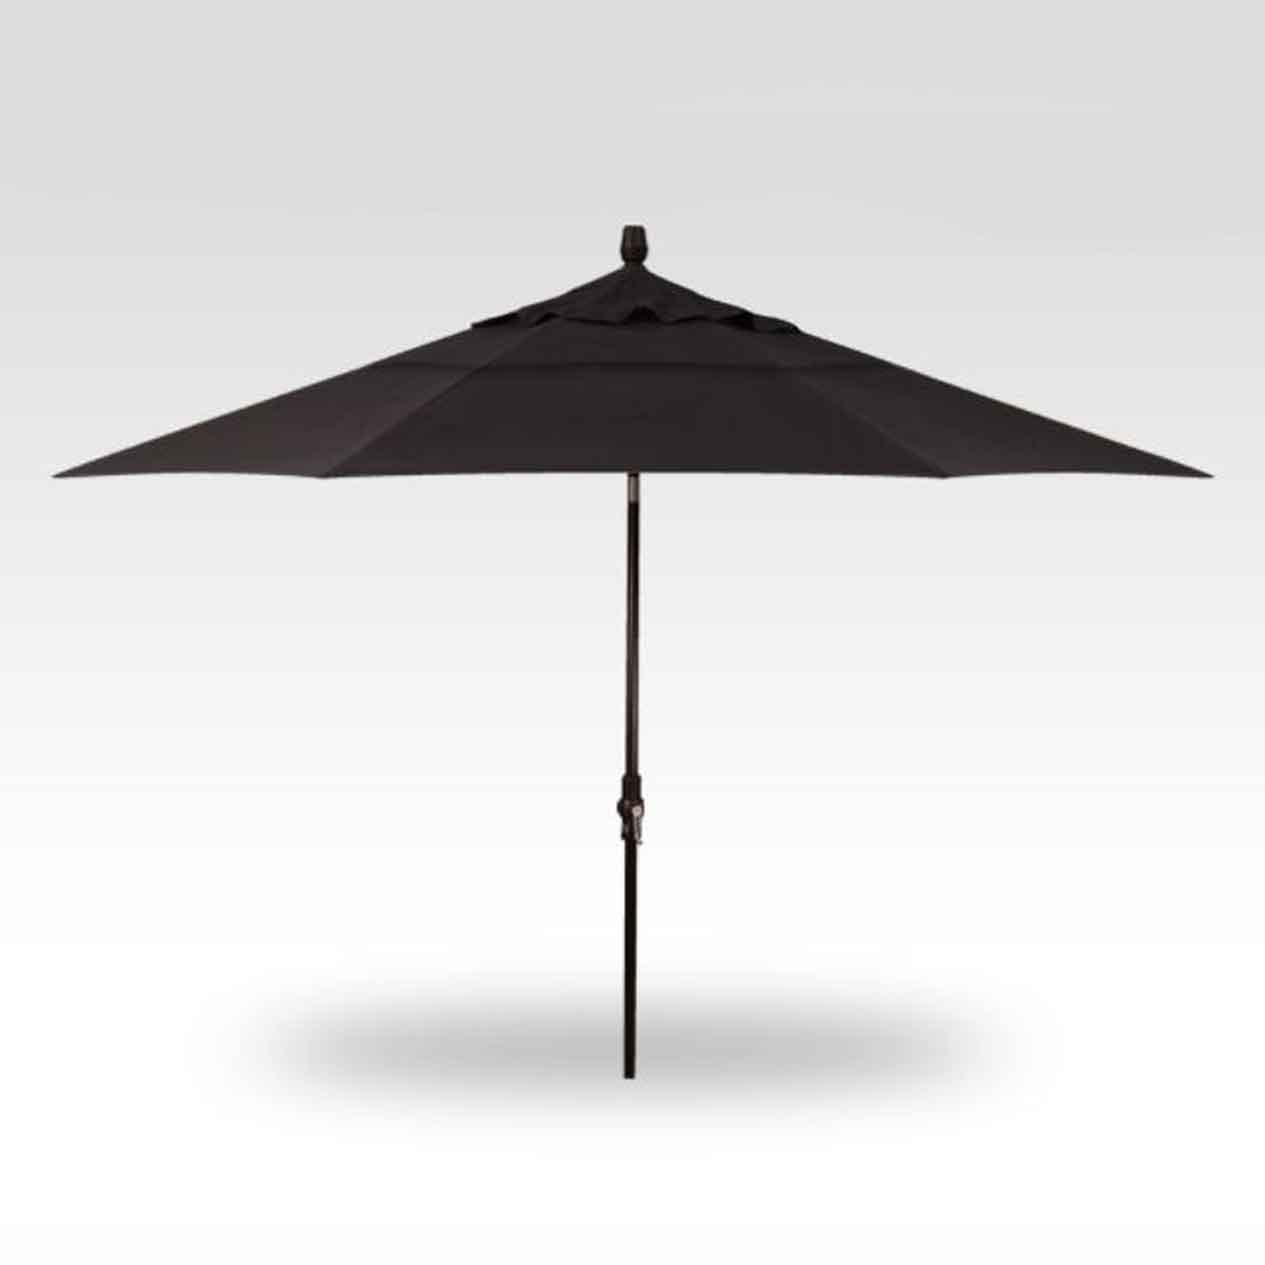 11' Collar Tilt Market Umbrella - Black